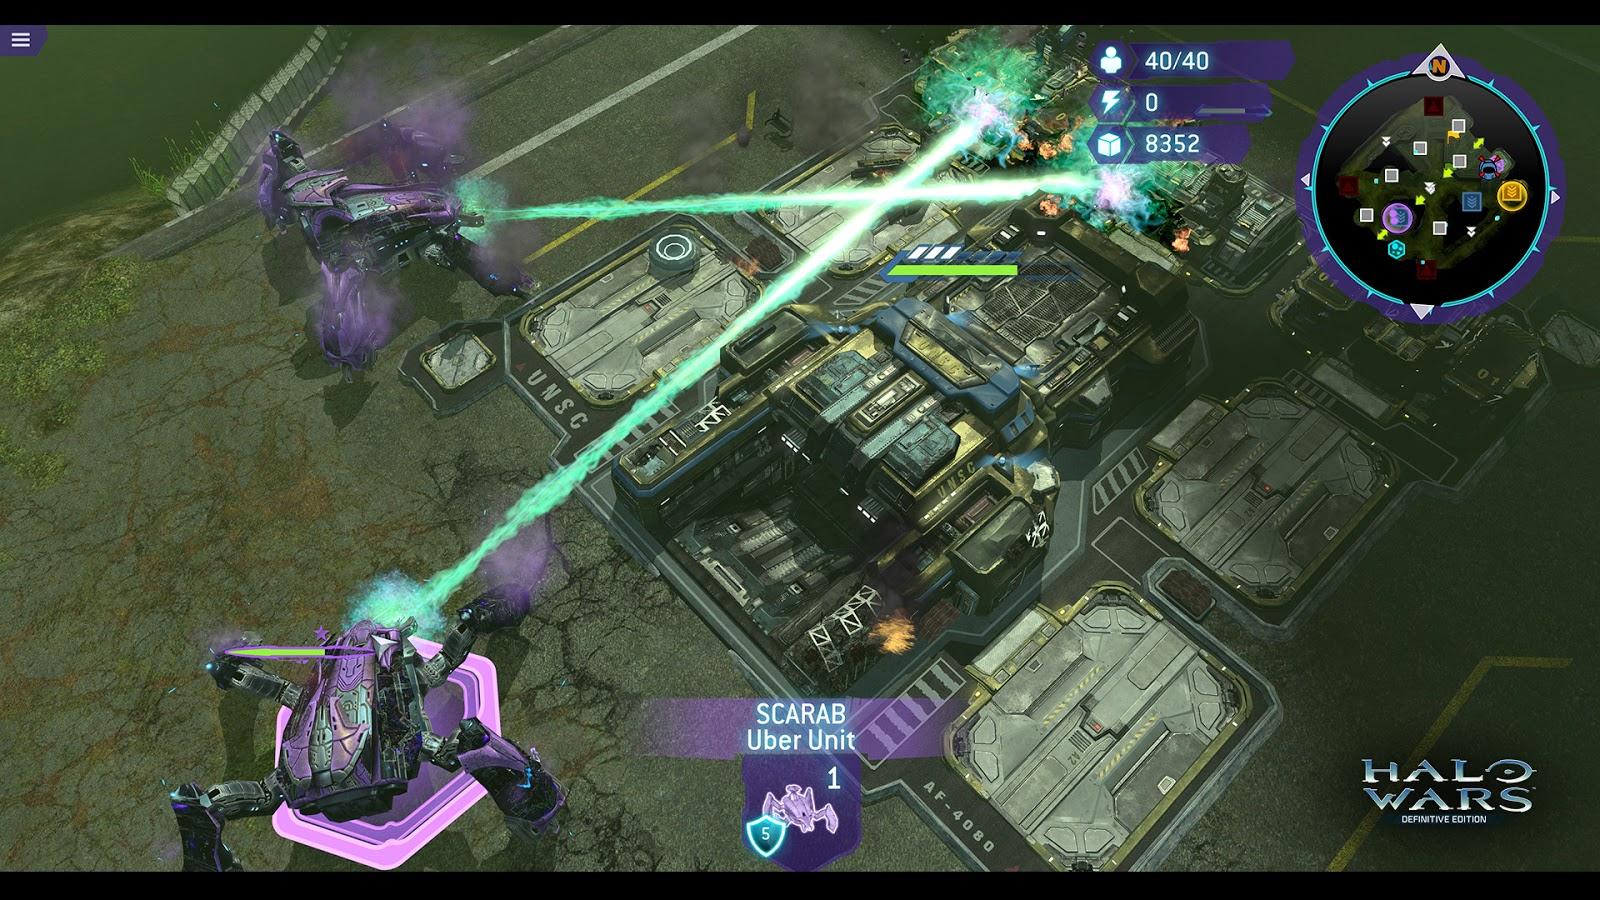 Halo Wars Definitive Edition ESPAÑOL PC Full + Hotfix 2 (CODEX) + REPACK 2 DVD5 (JPW) 8